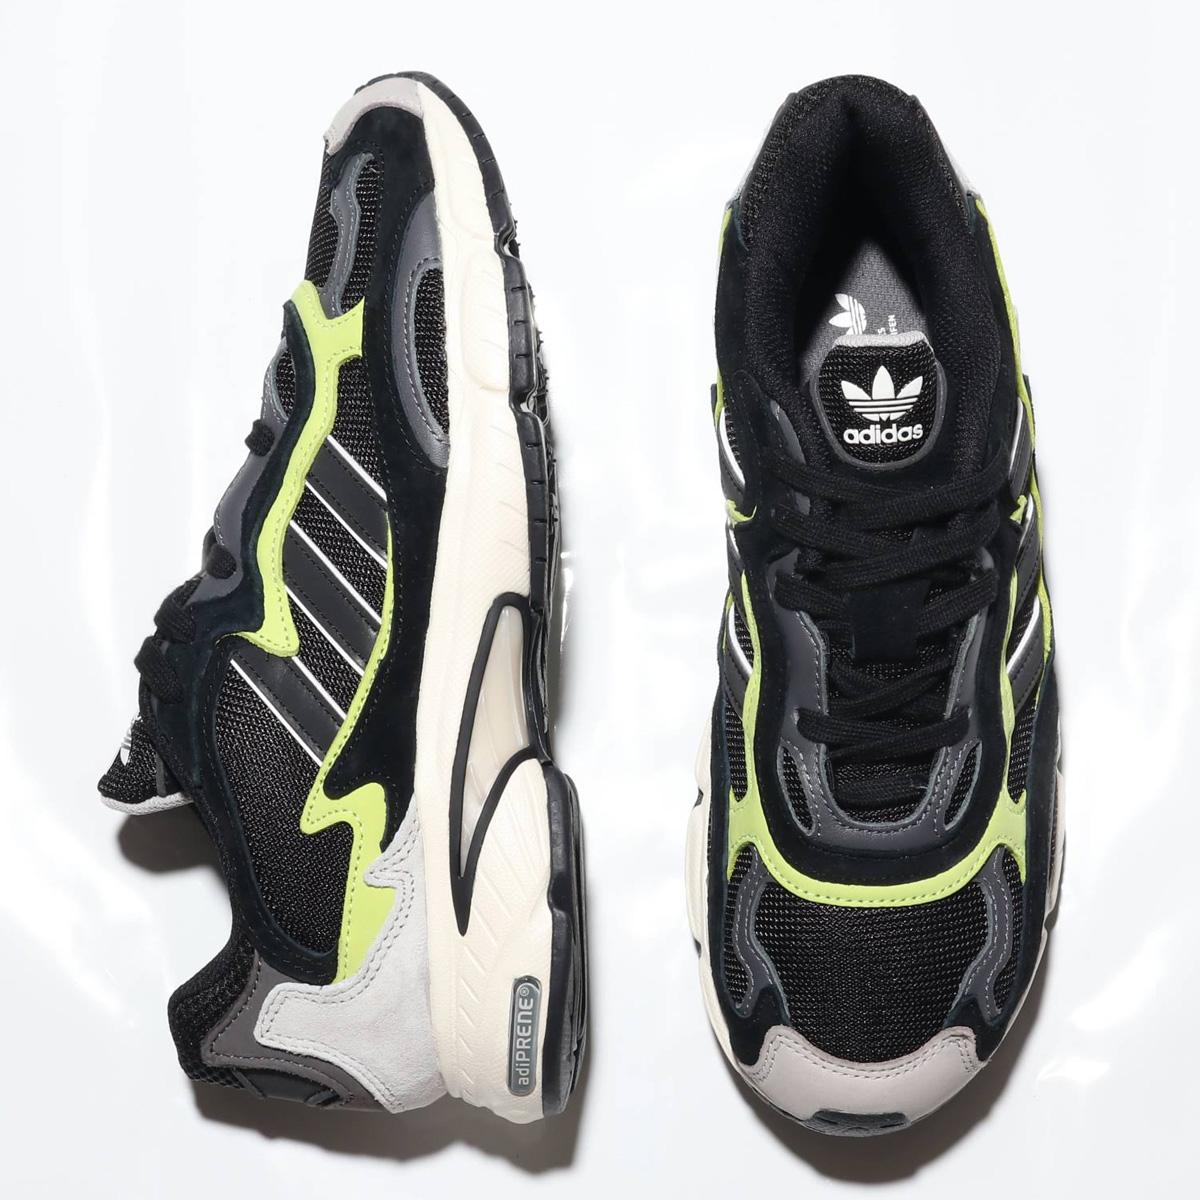 adidas Originals TEMPER RUN(アディダス オリジナルス テンパー ラン) CORE BLACK/CORE BLACK/GLOW【メンズ レディース スニーカー】18FW-S